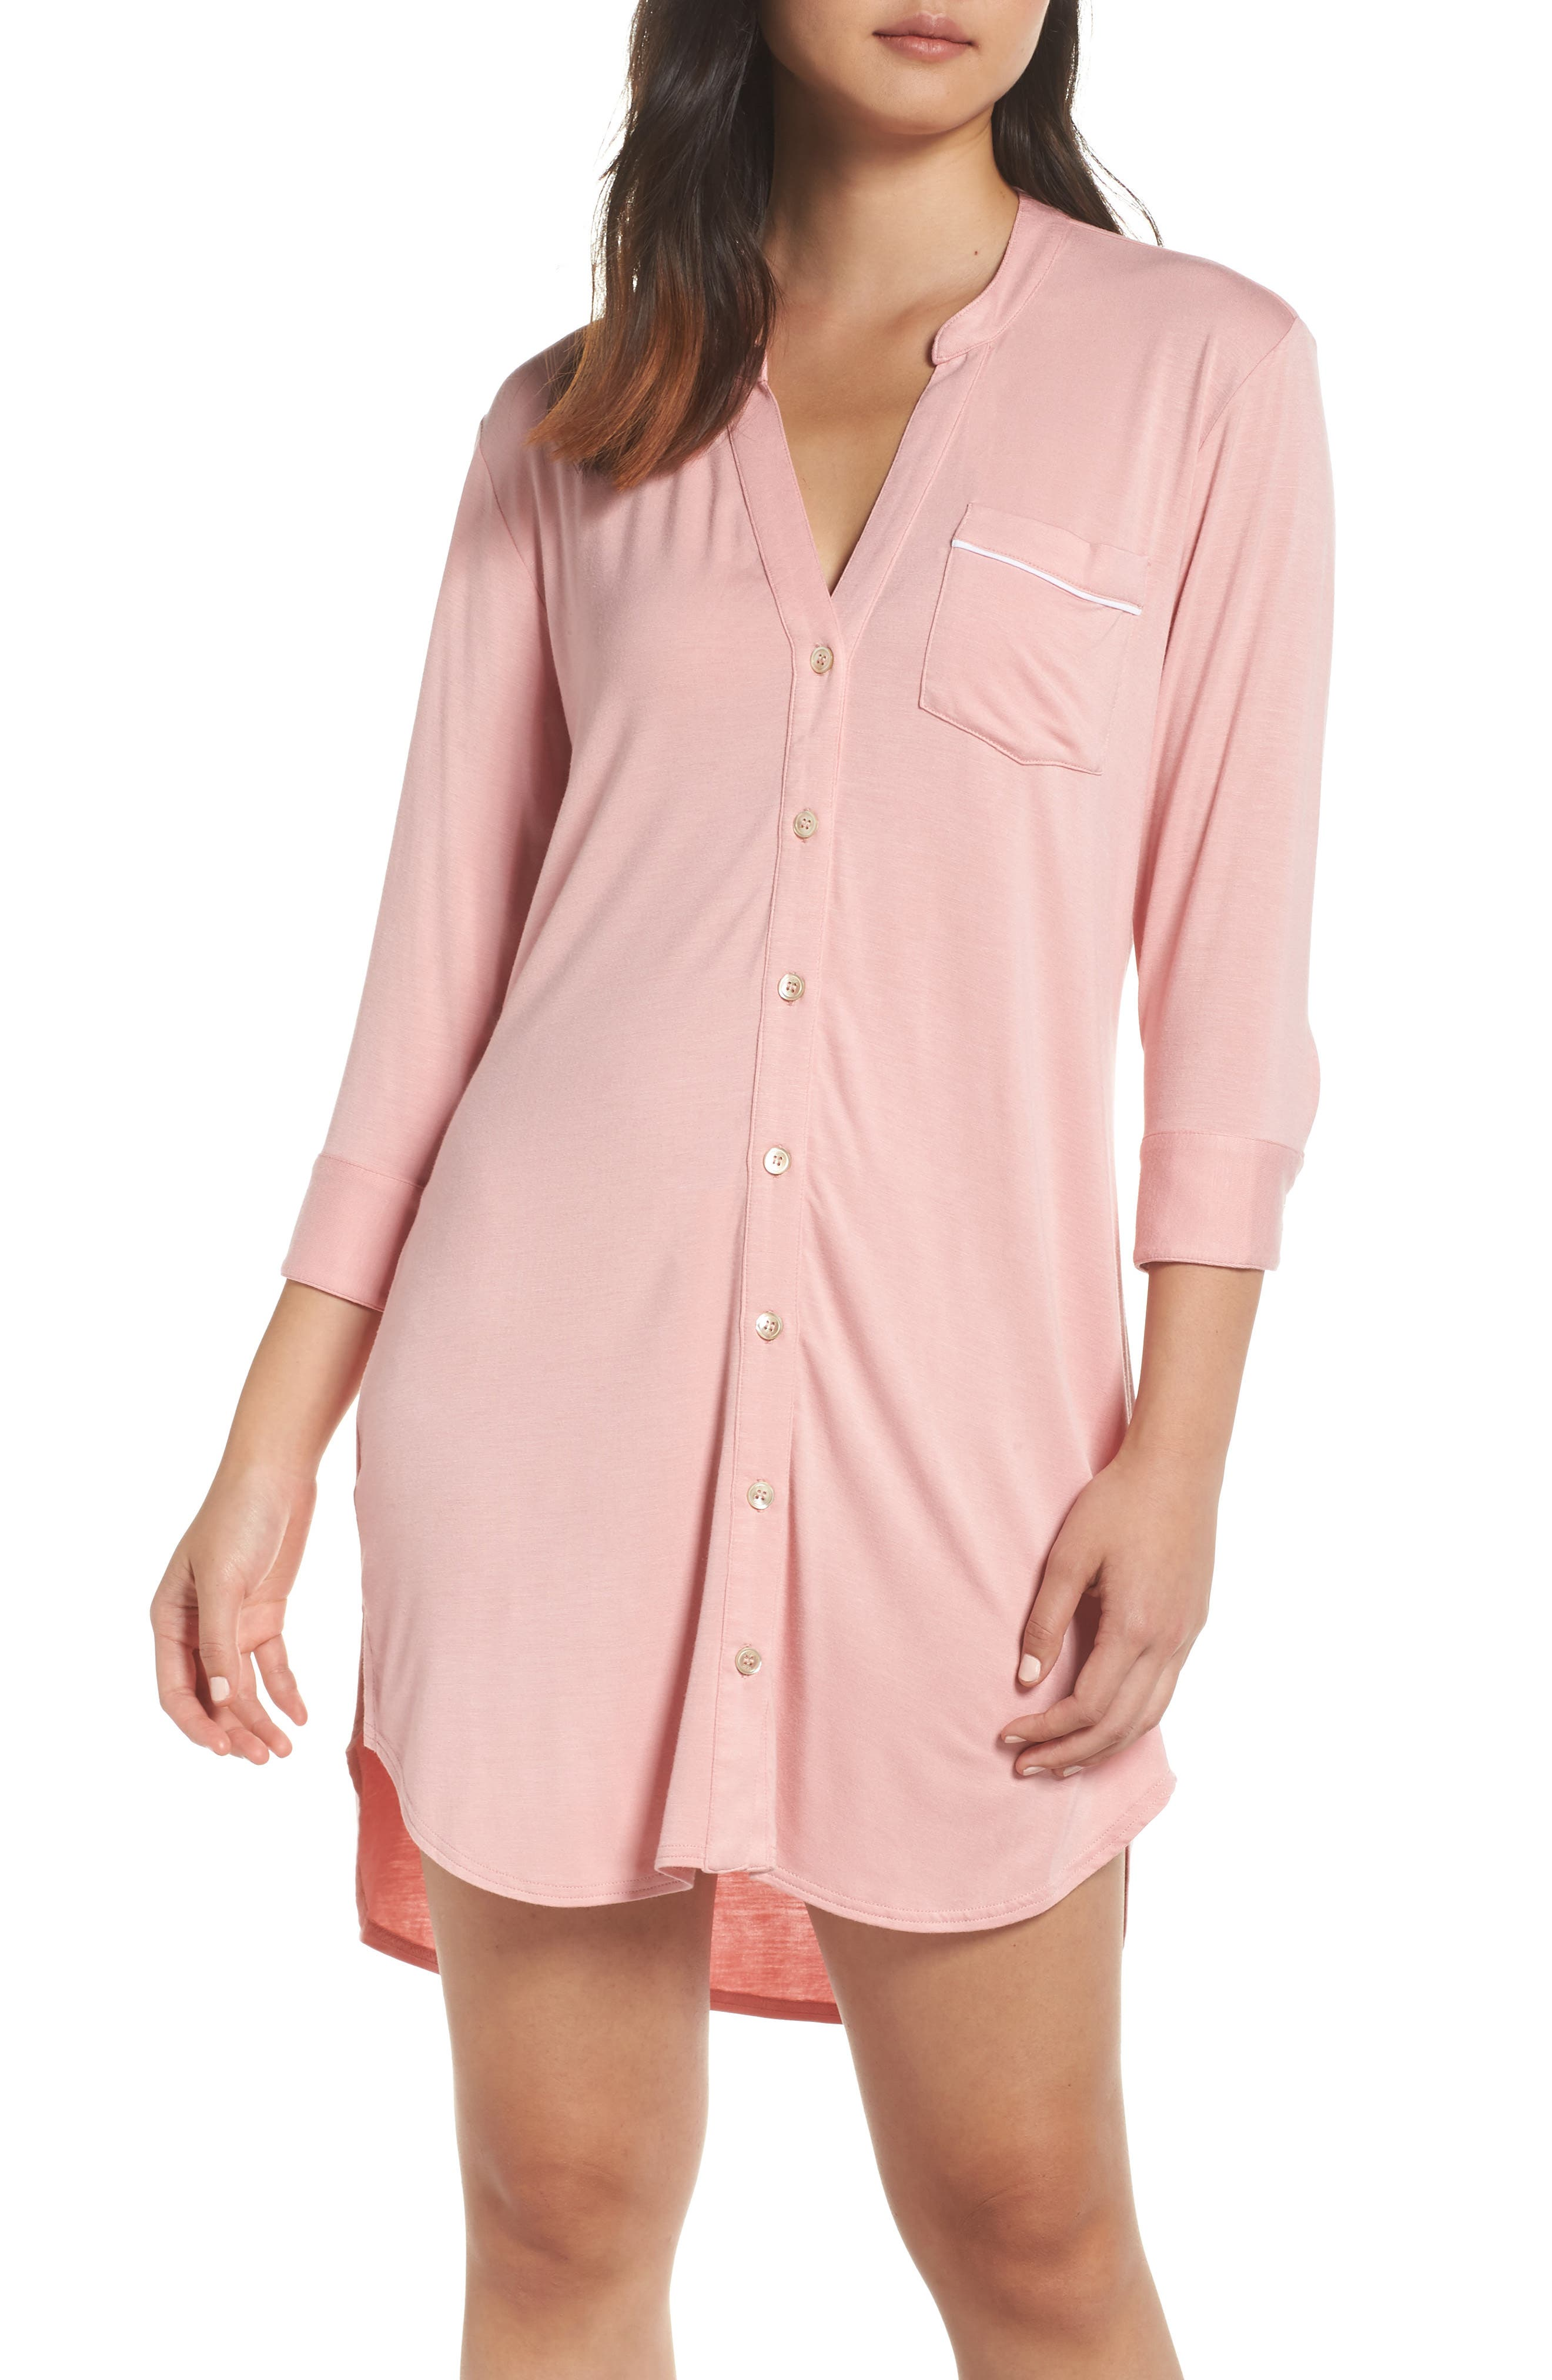 Ugg Vivian Sleep Shirt, Pink